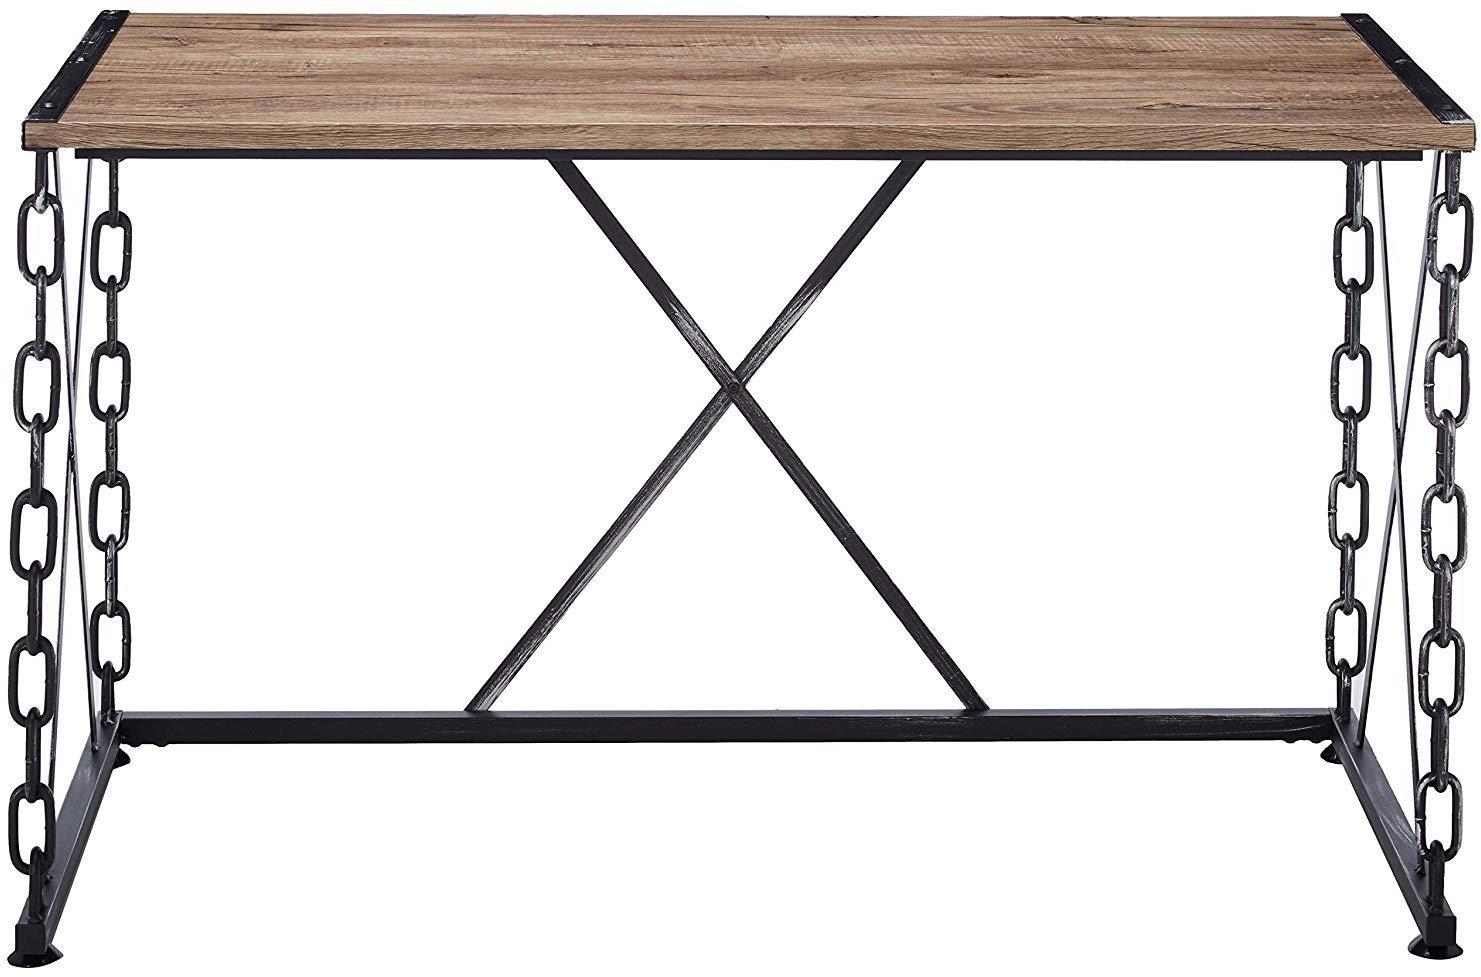 "48"" X 24"" X 28"" Rustic Oak And Antique Black Particle Board Desk"